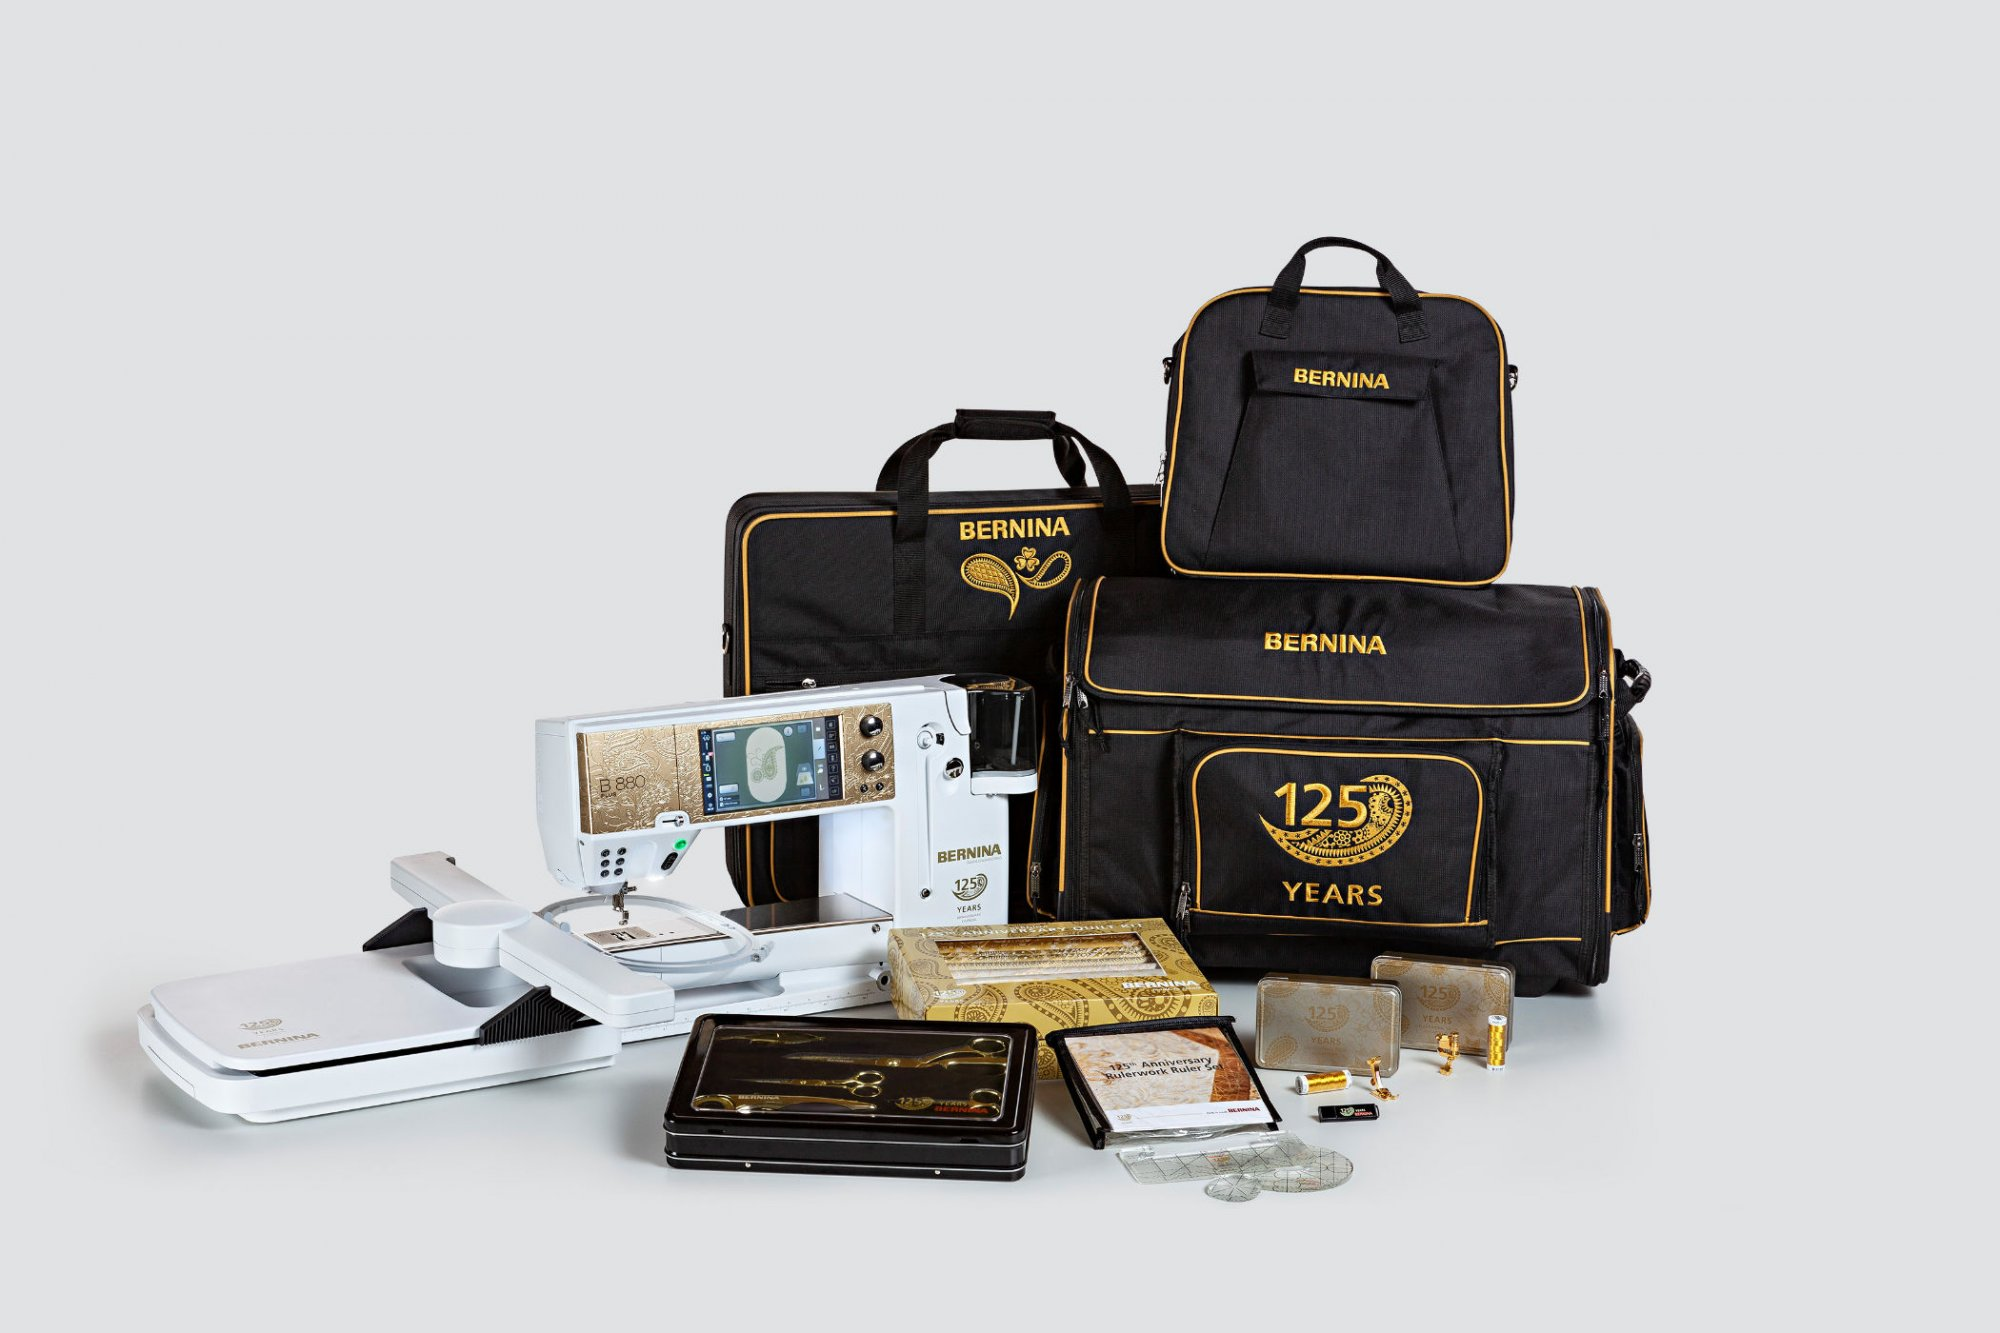 BERNINA B790SE PLUS GOLD  W/EMB-CLOSEOUT